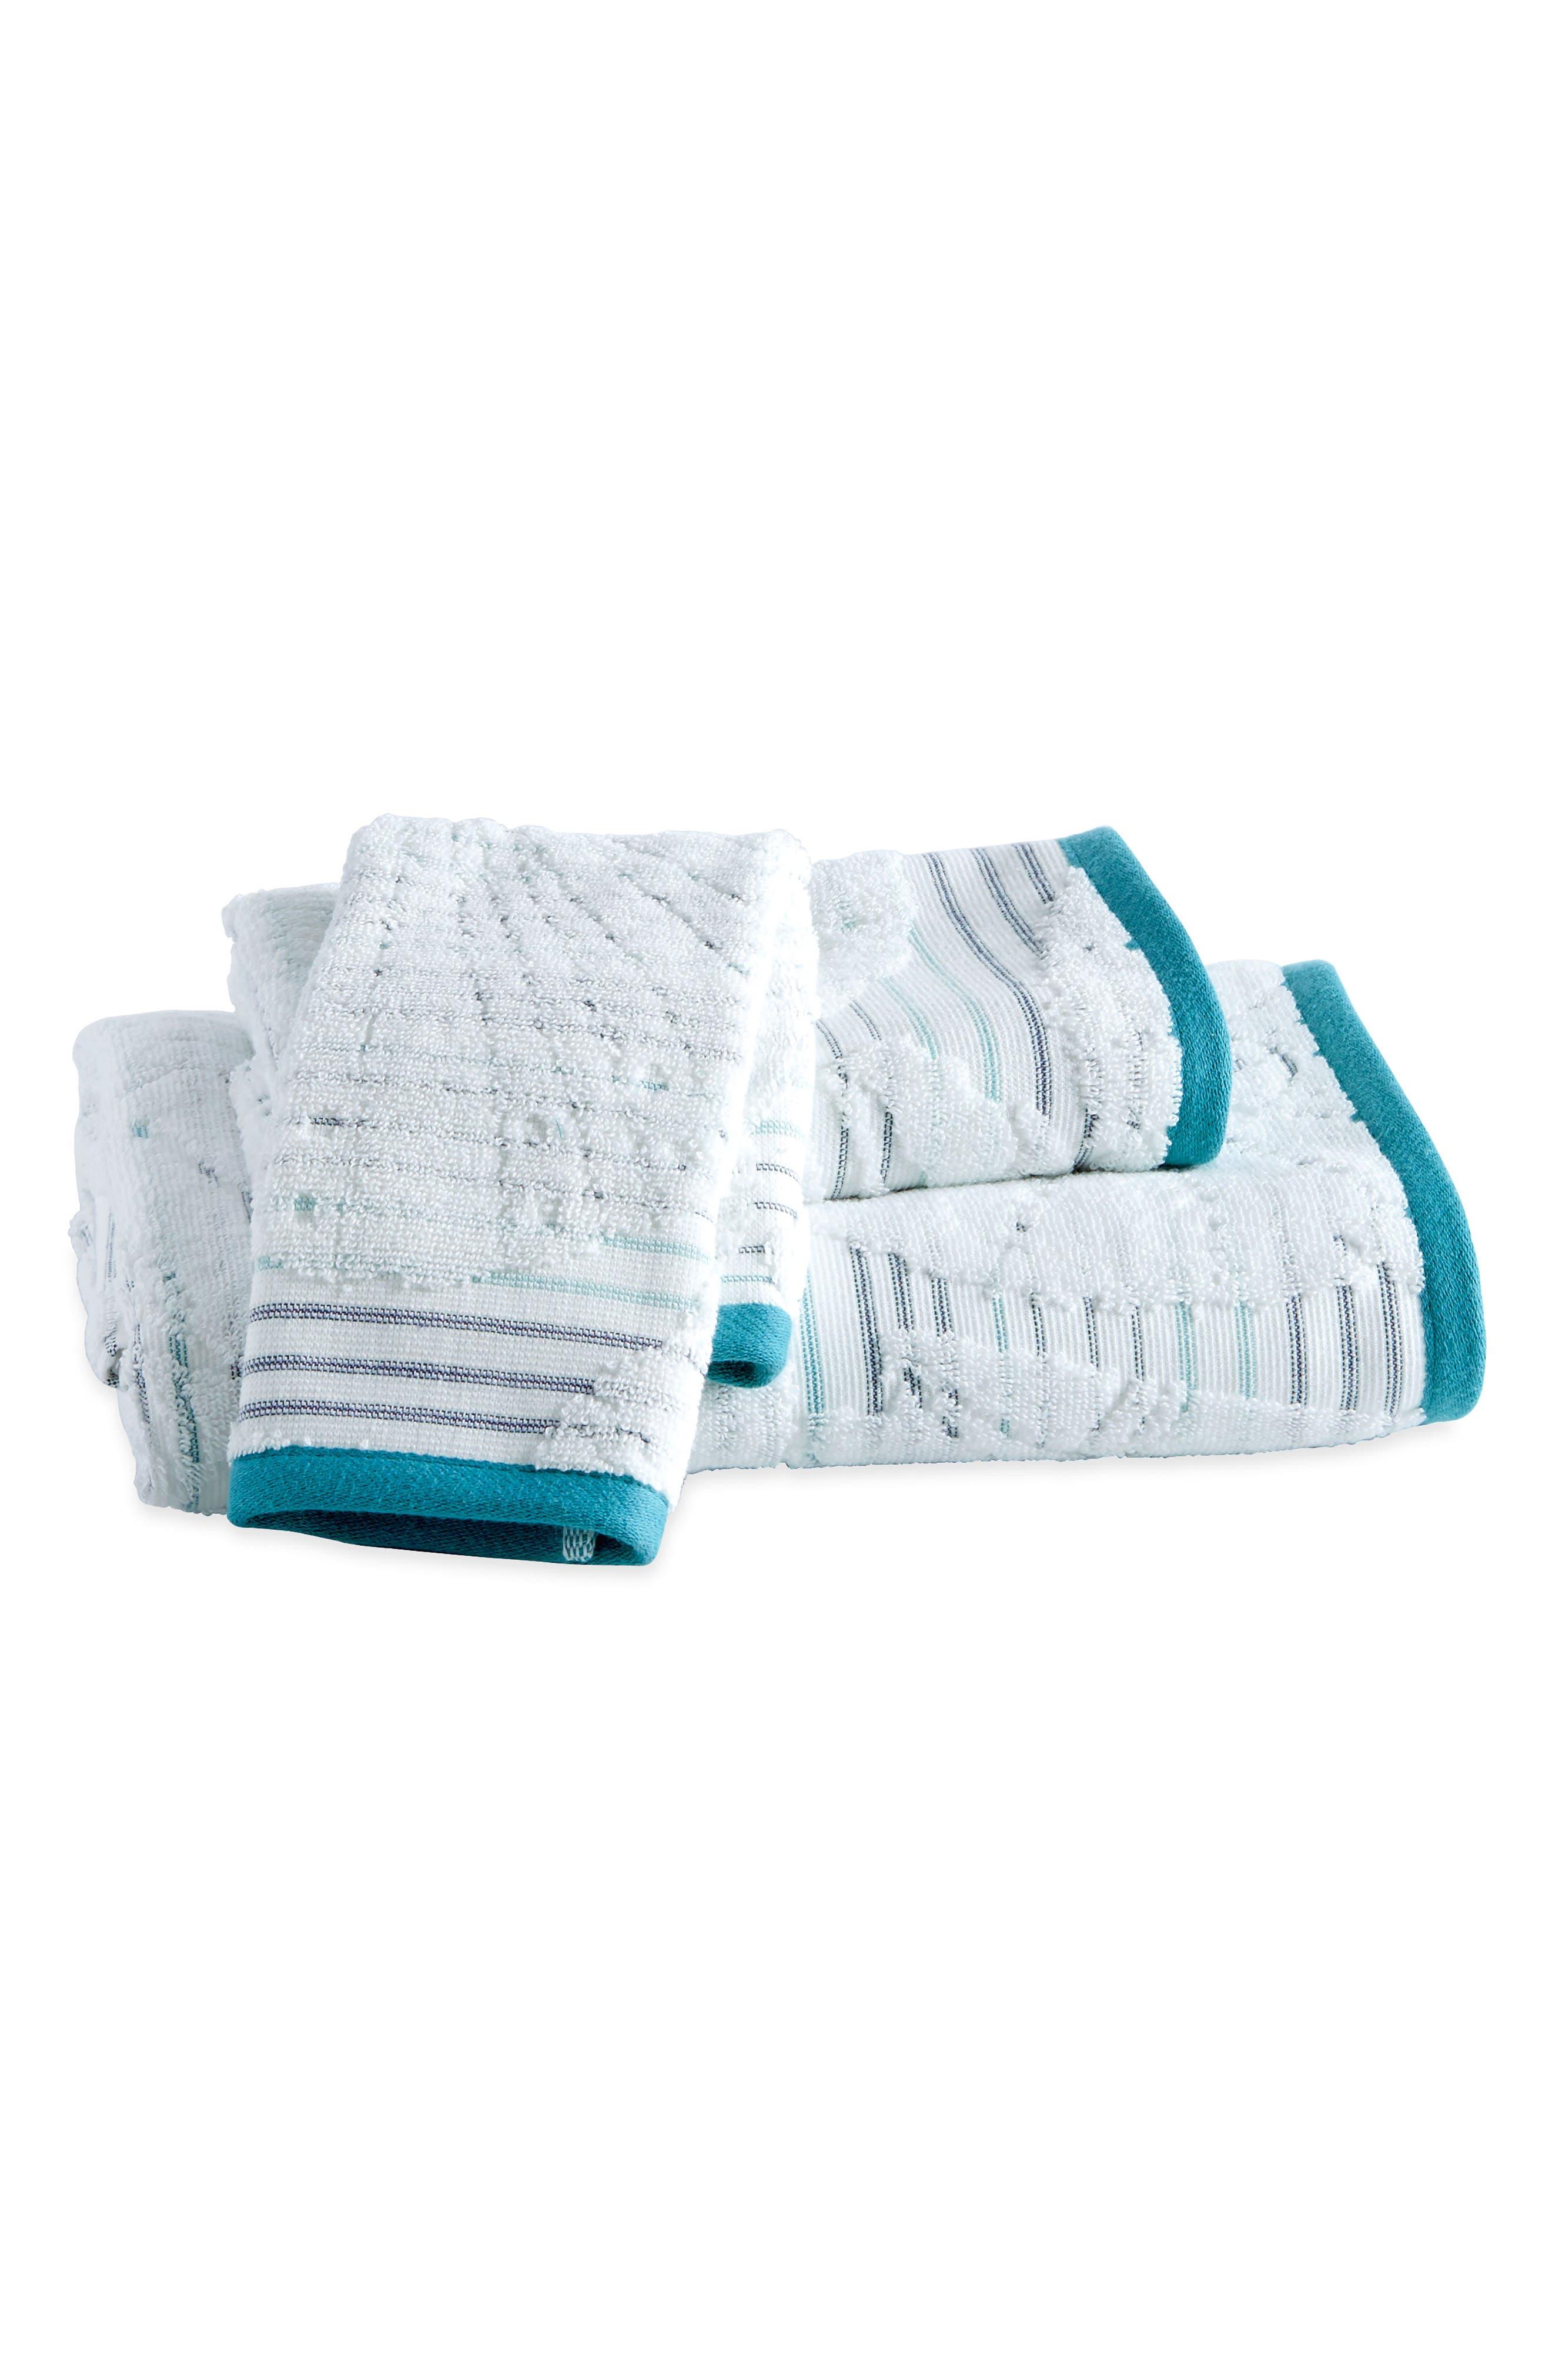 Main Image - Destinations Mykonos Bath Towel, Hand Towel and Washcloth Set